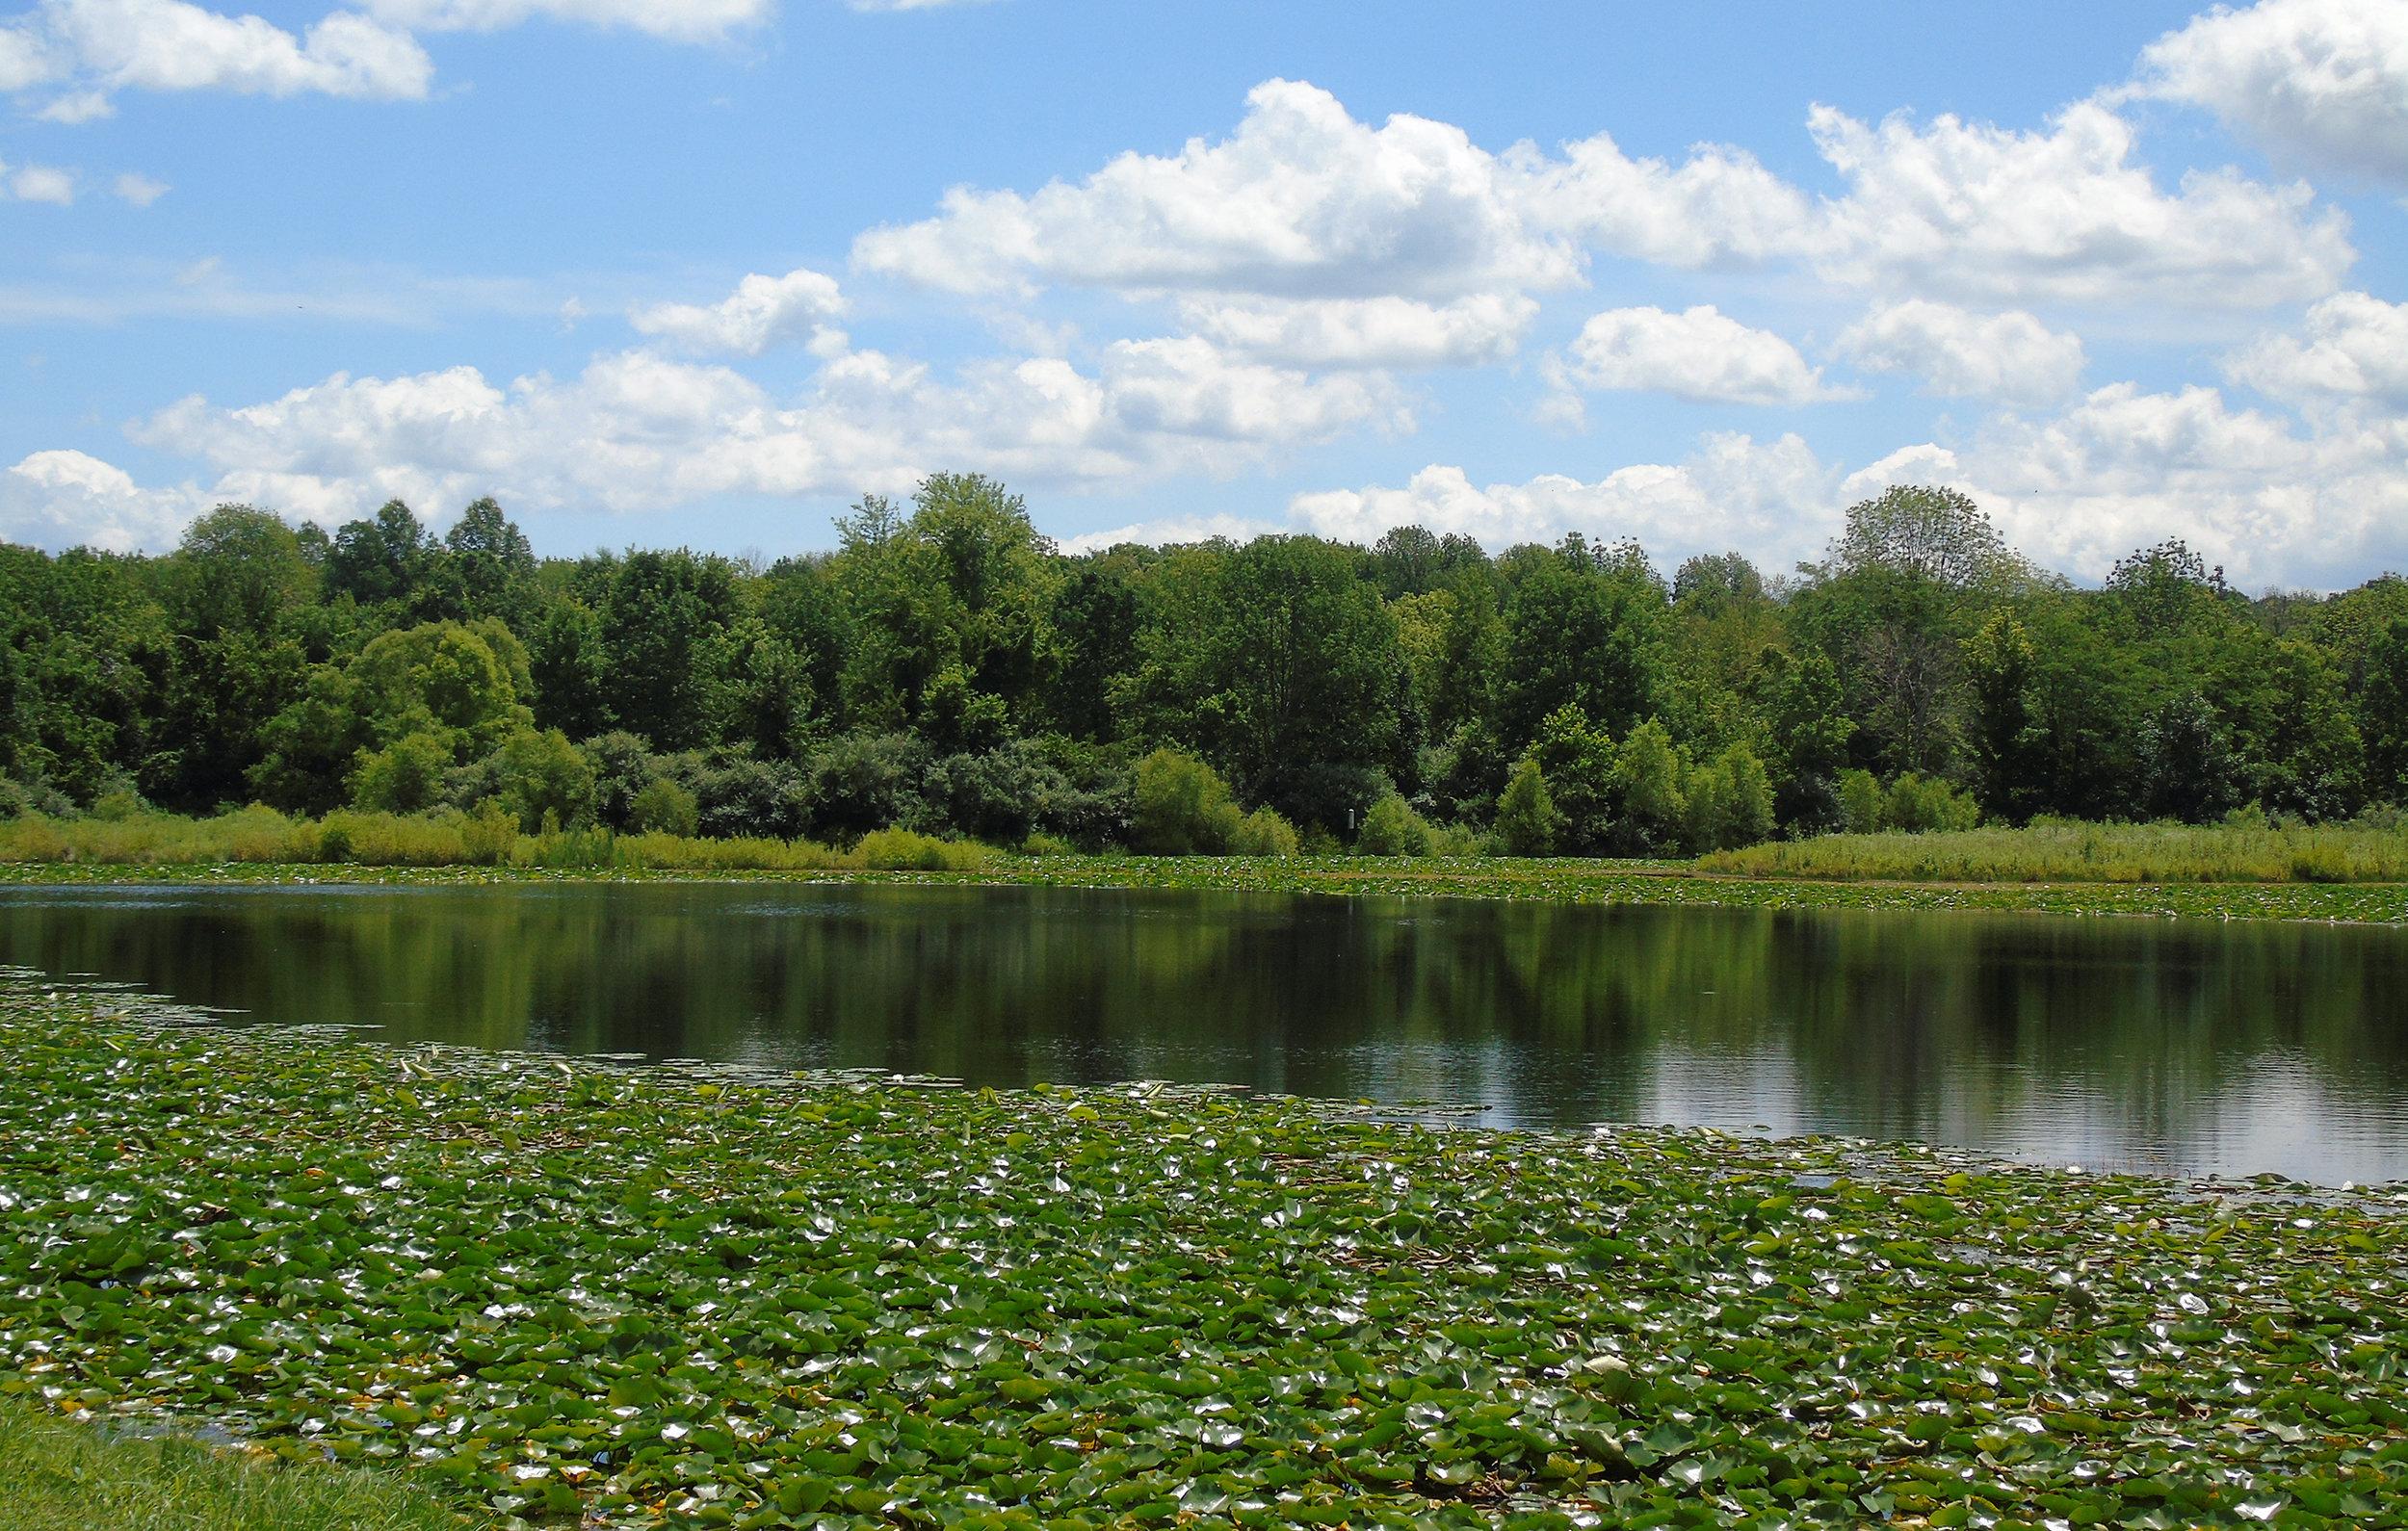 SLR_Buzzard's Roost Lake_July_C Svoboda.jpg